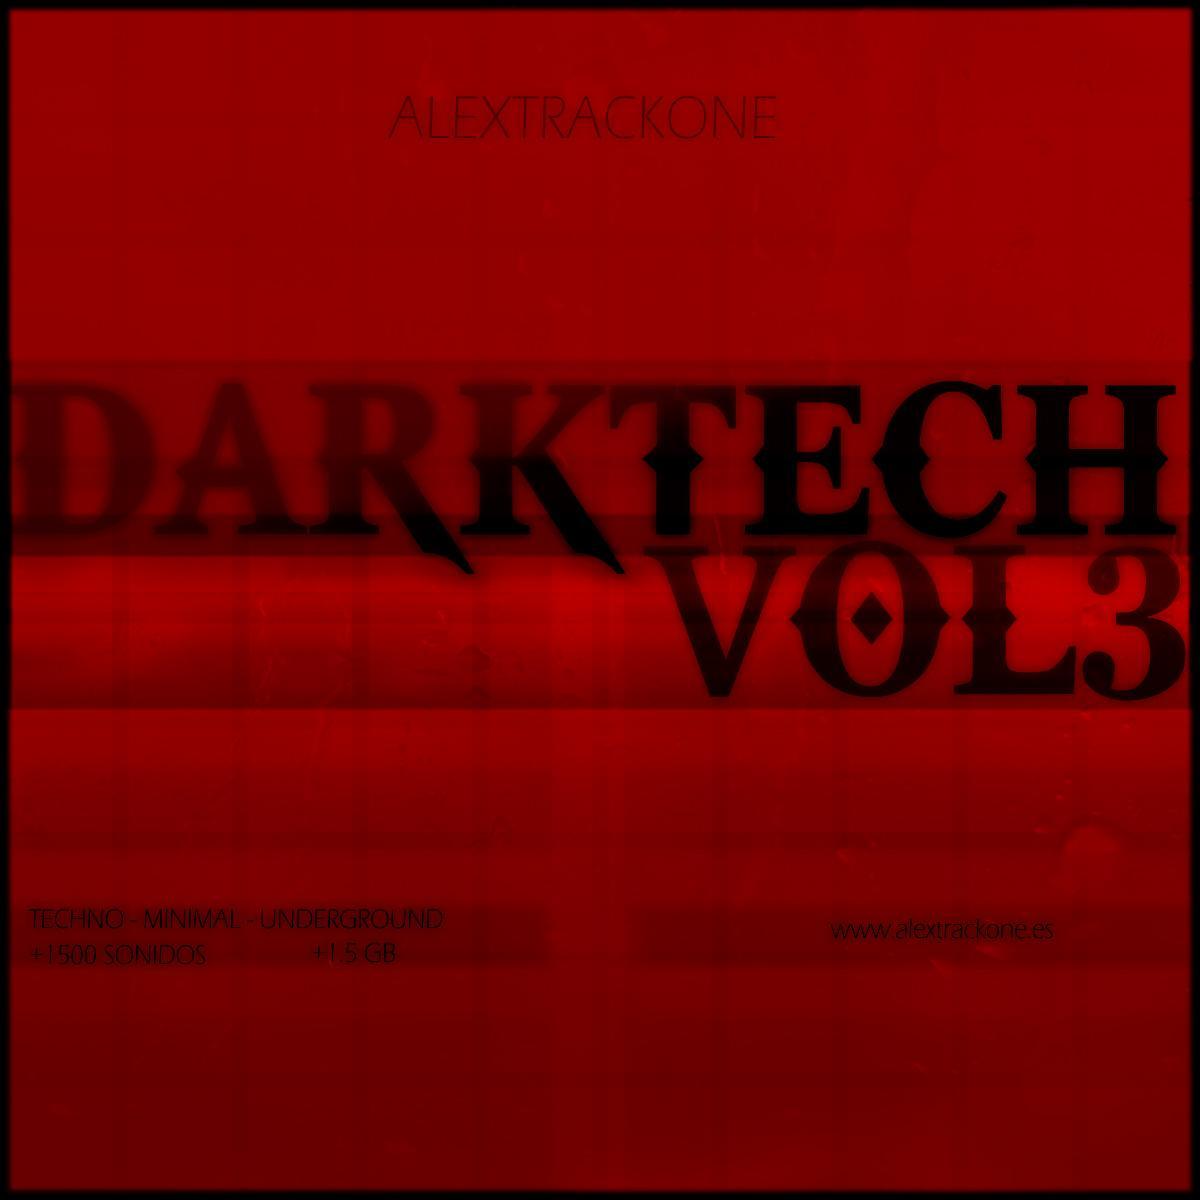 DarkTech Vol 3 - Samples WAV-